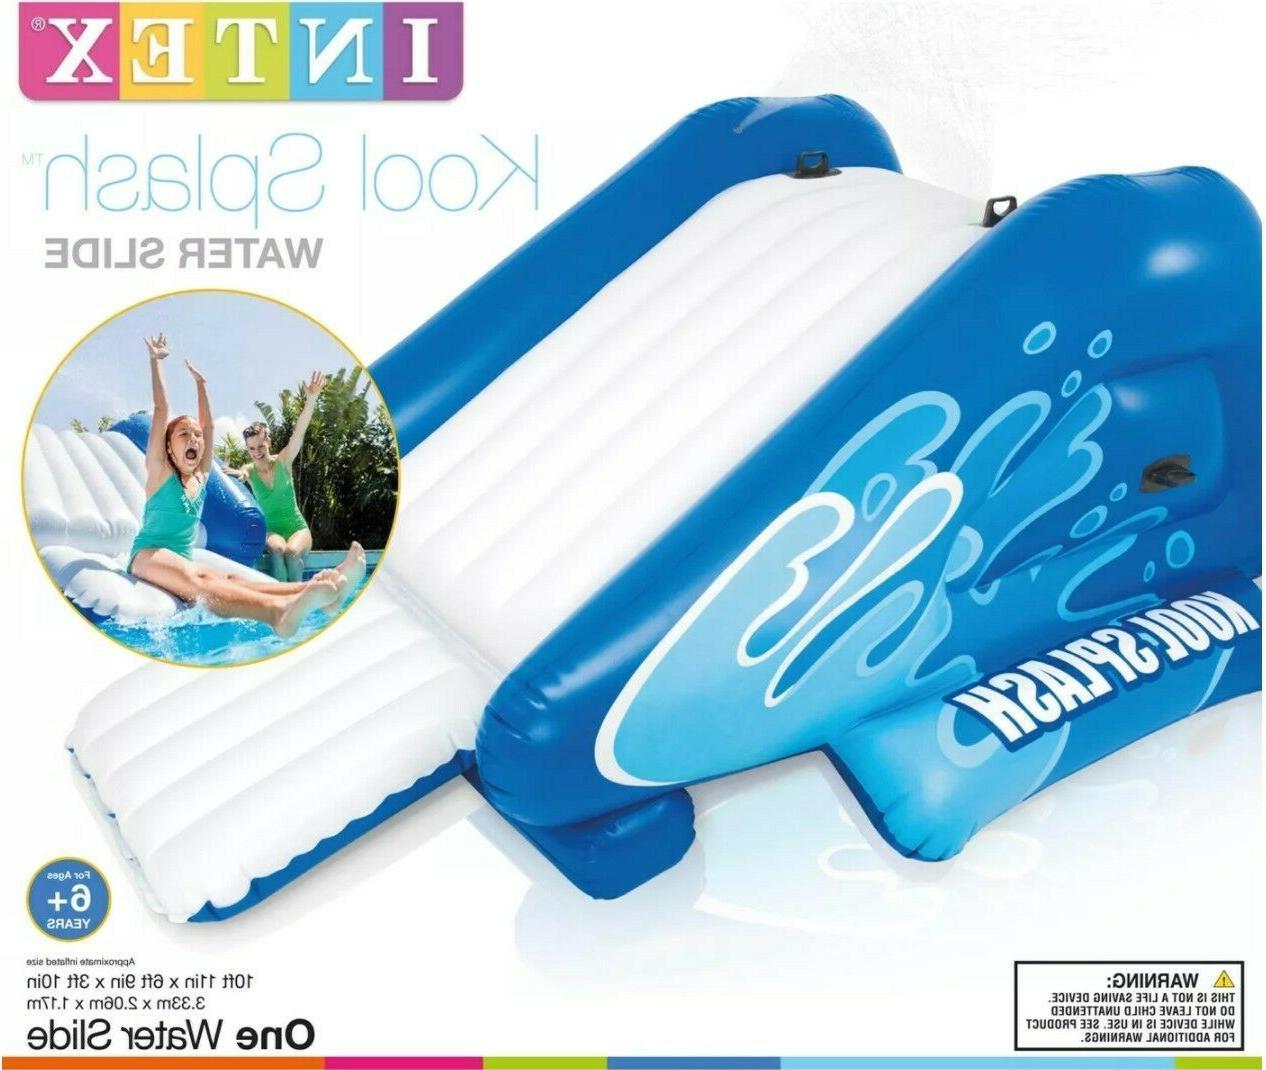 brand new kool splash inflatable play center